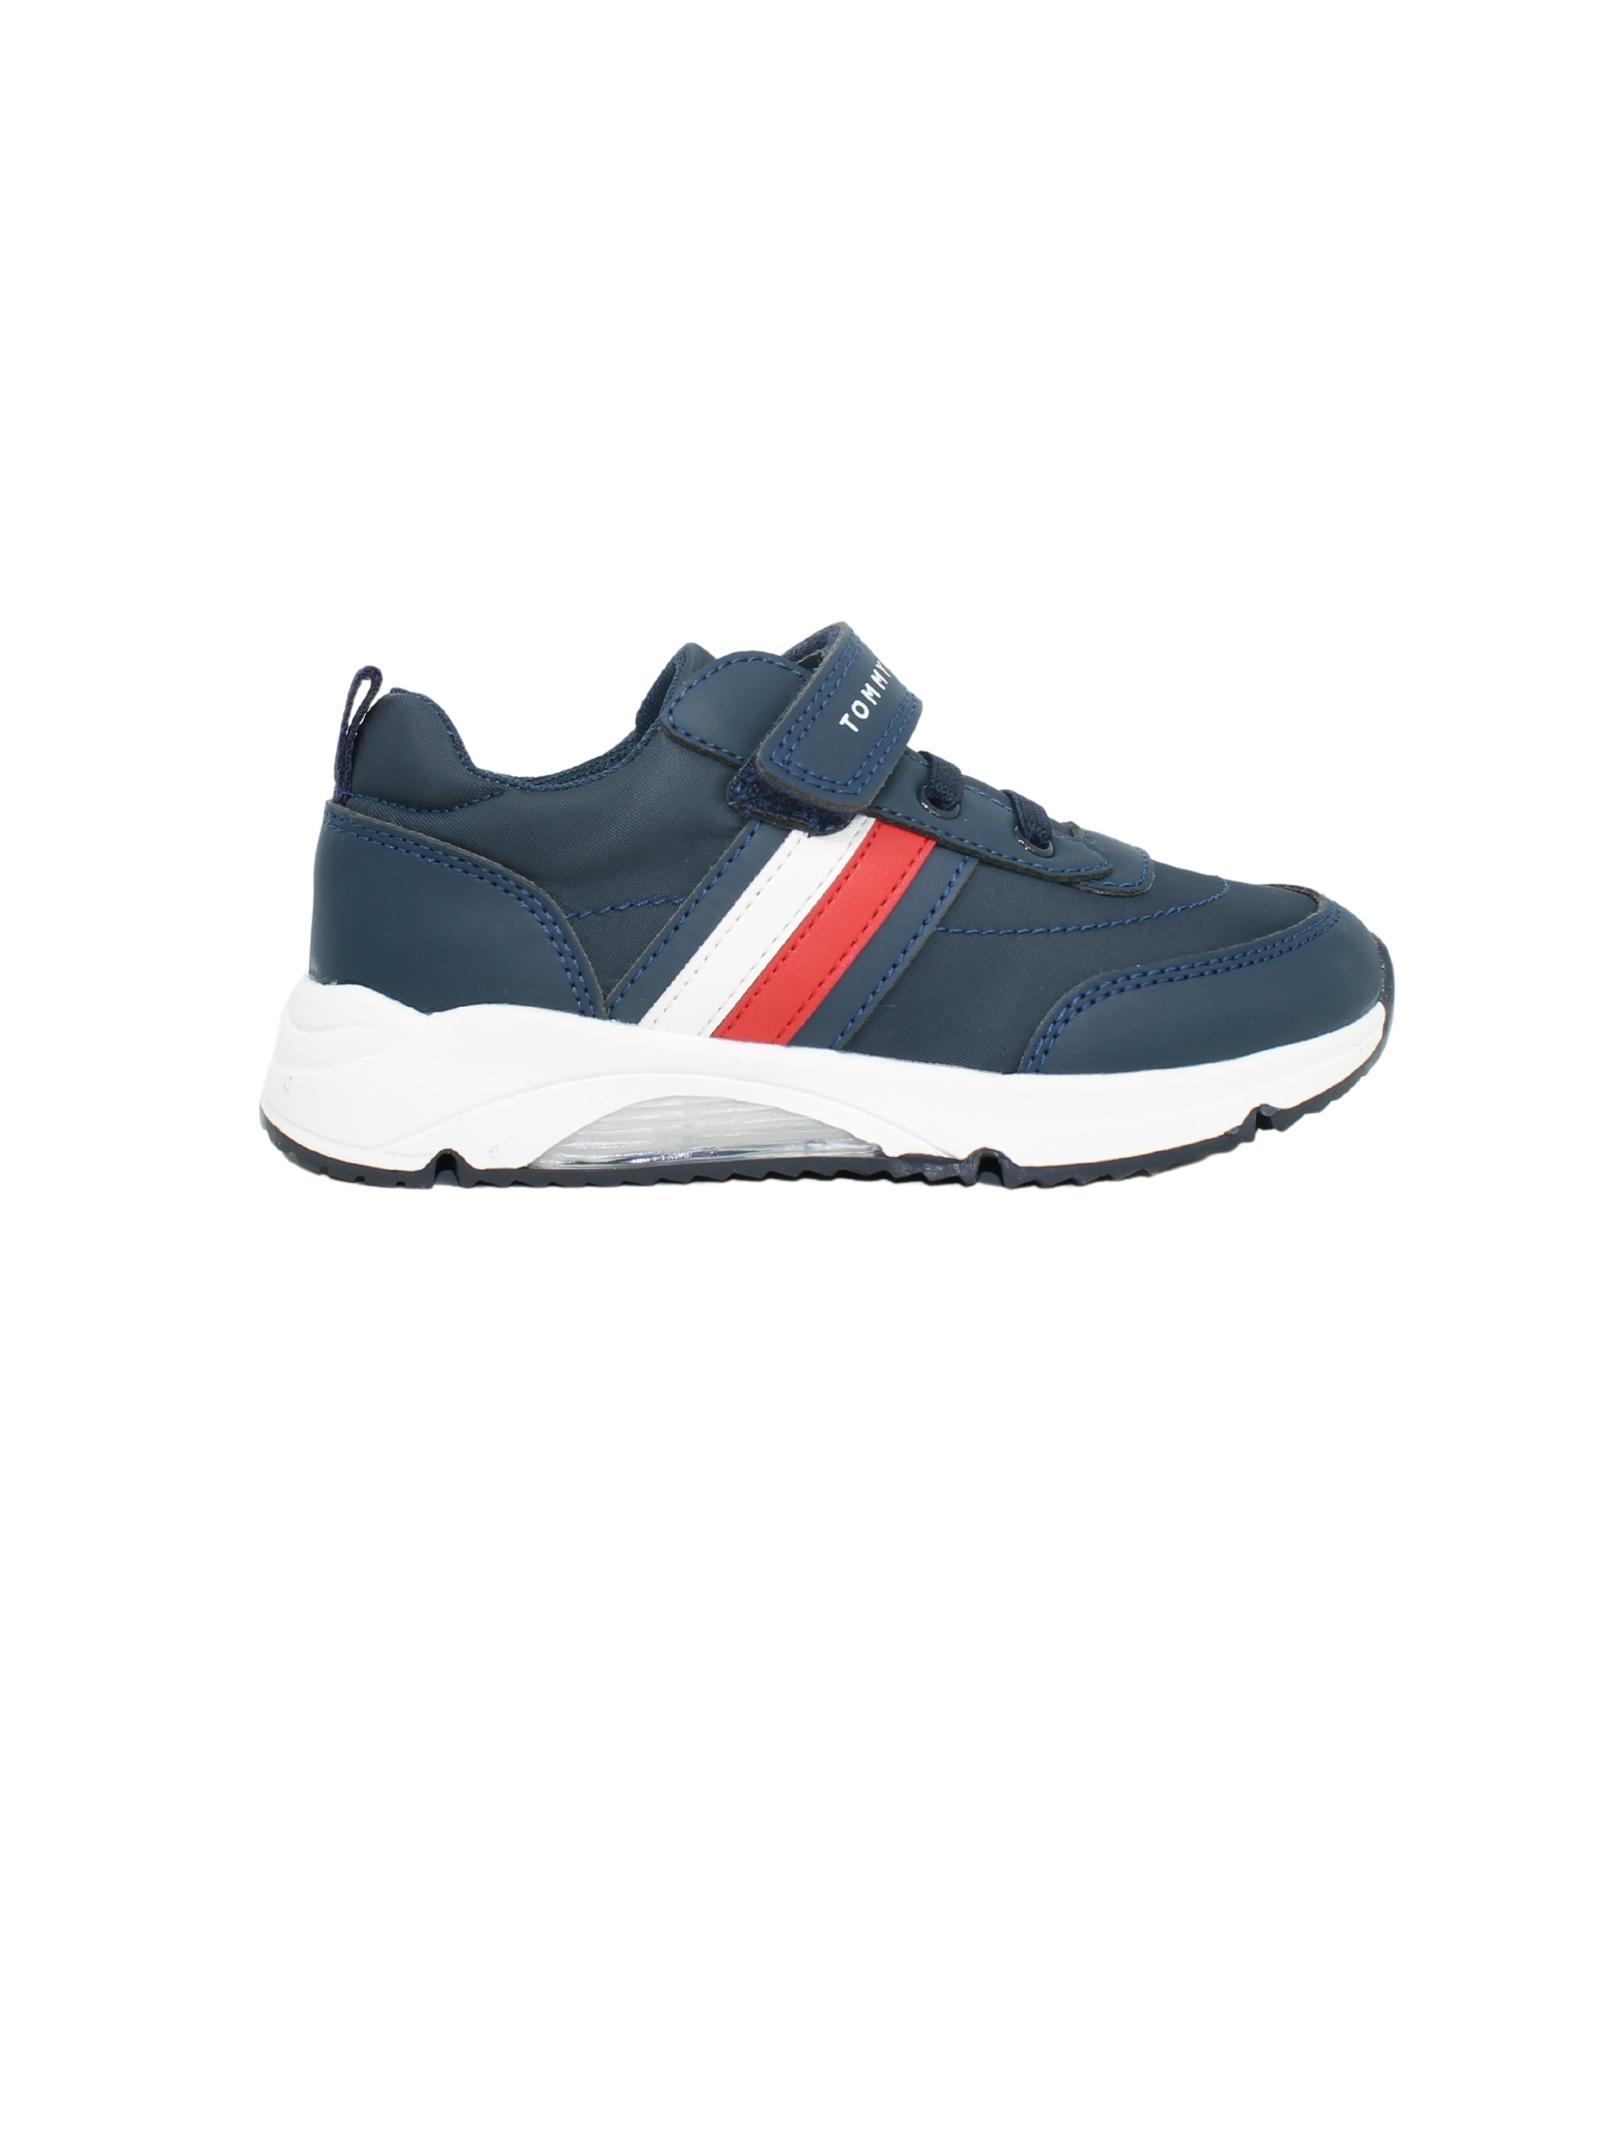 Sneakers Blue Bambino TOMMY HILFIGER KIDS | Sneakers | T1B4320691037800BLU